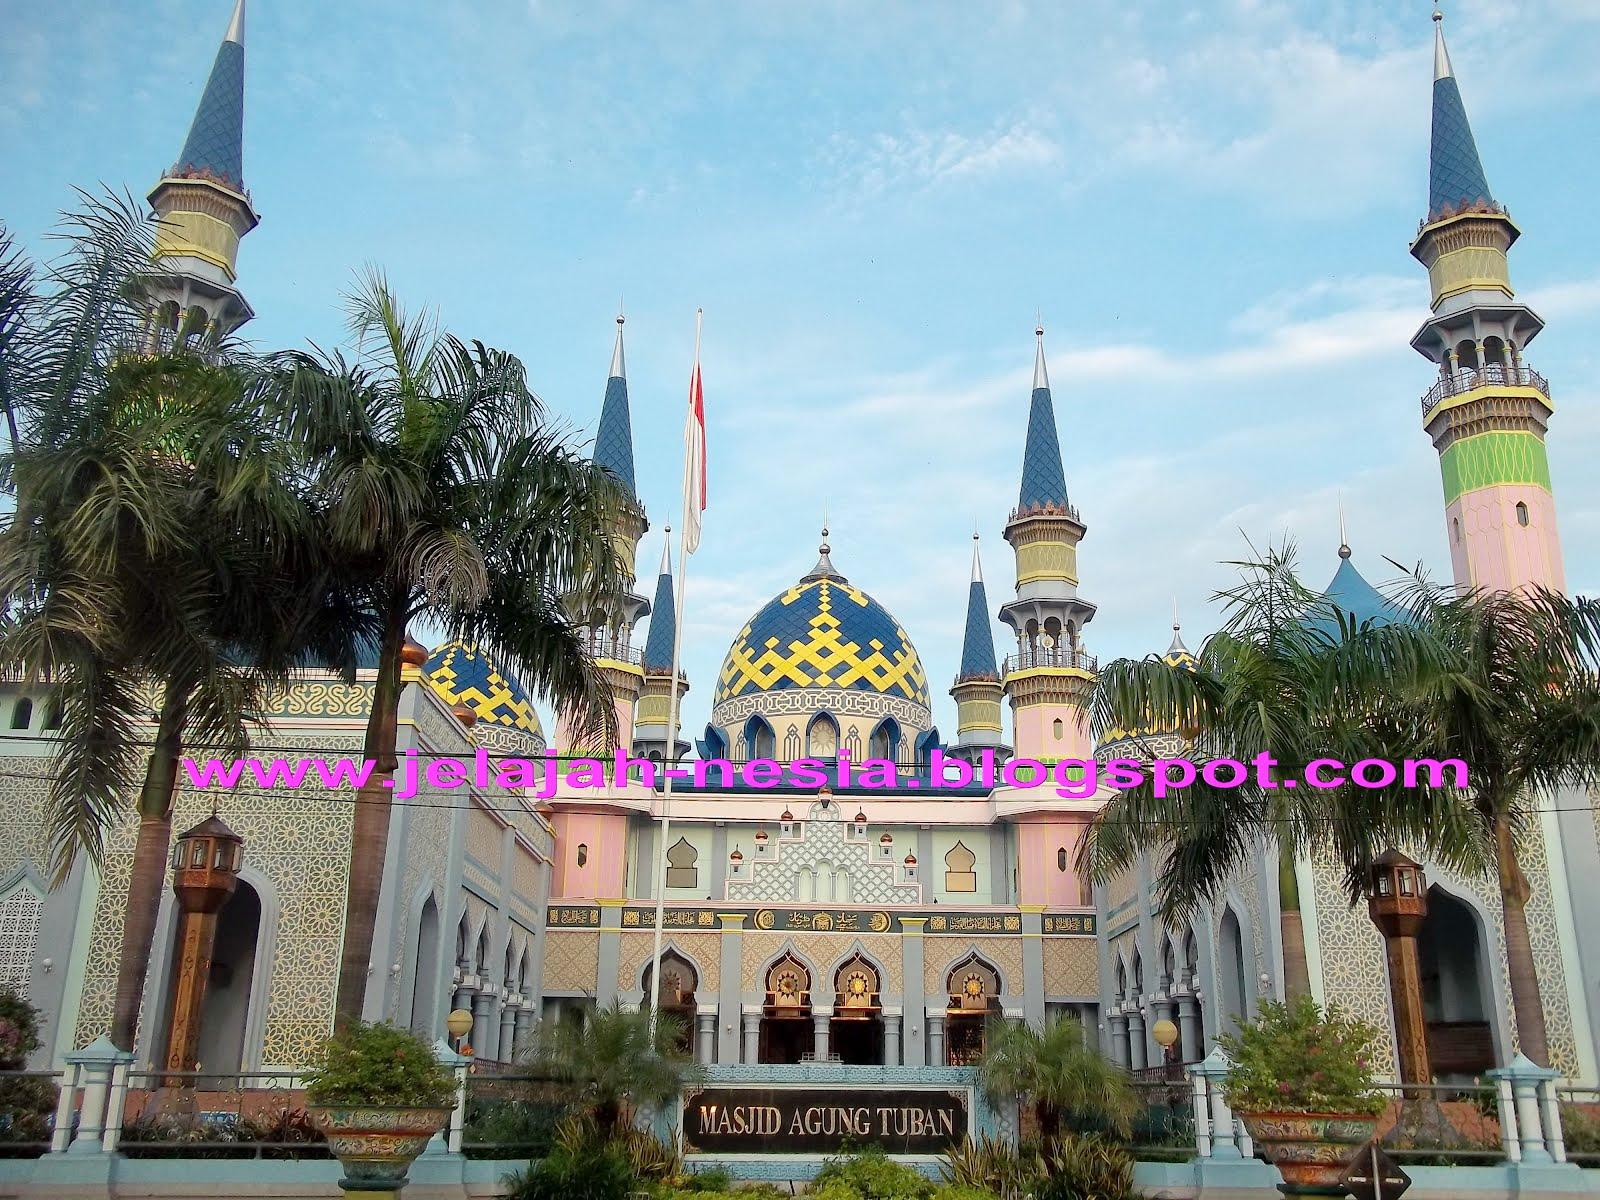 Www Jelajah Nesia Blogspot Pesona Keindahan Masjid Agung Tuban Lamongan